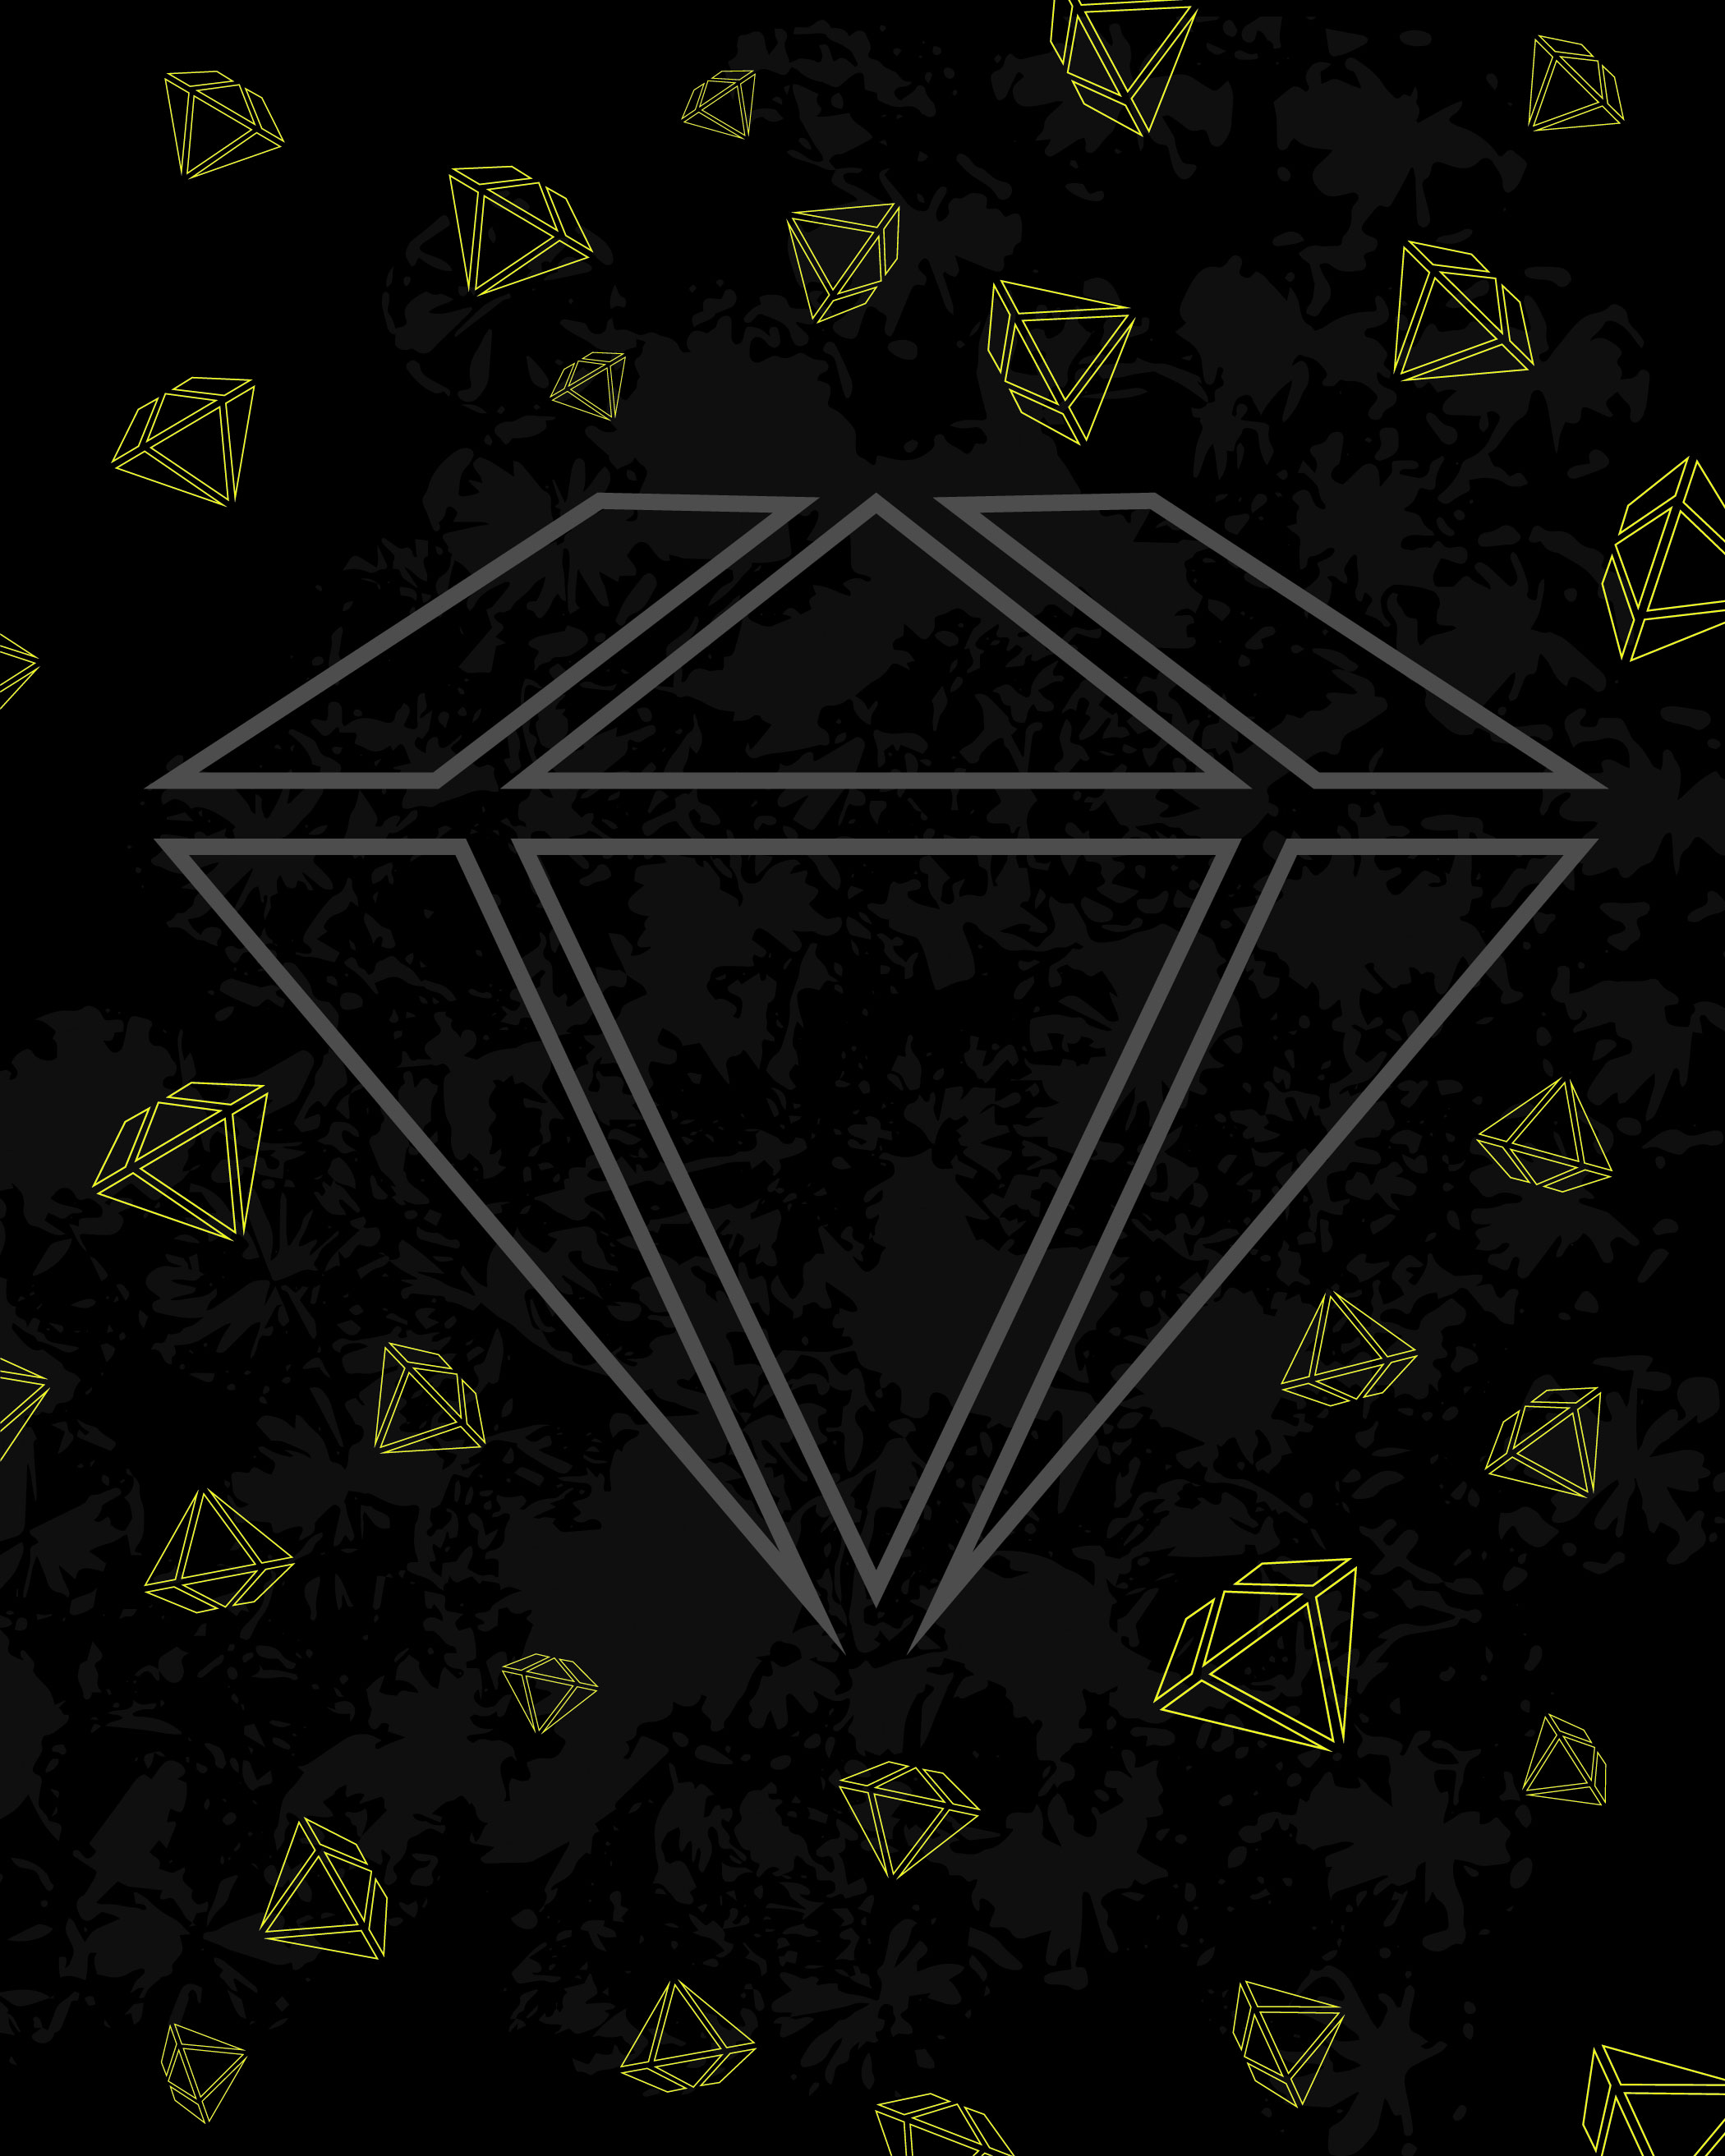 Raining Diamonds_Final-01.jpg